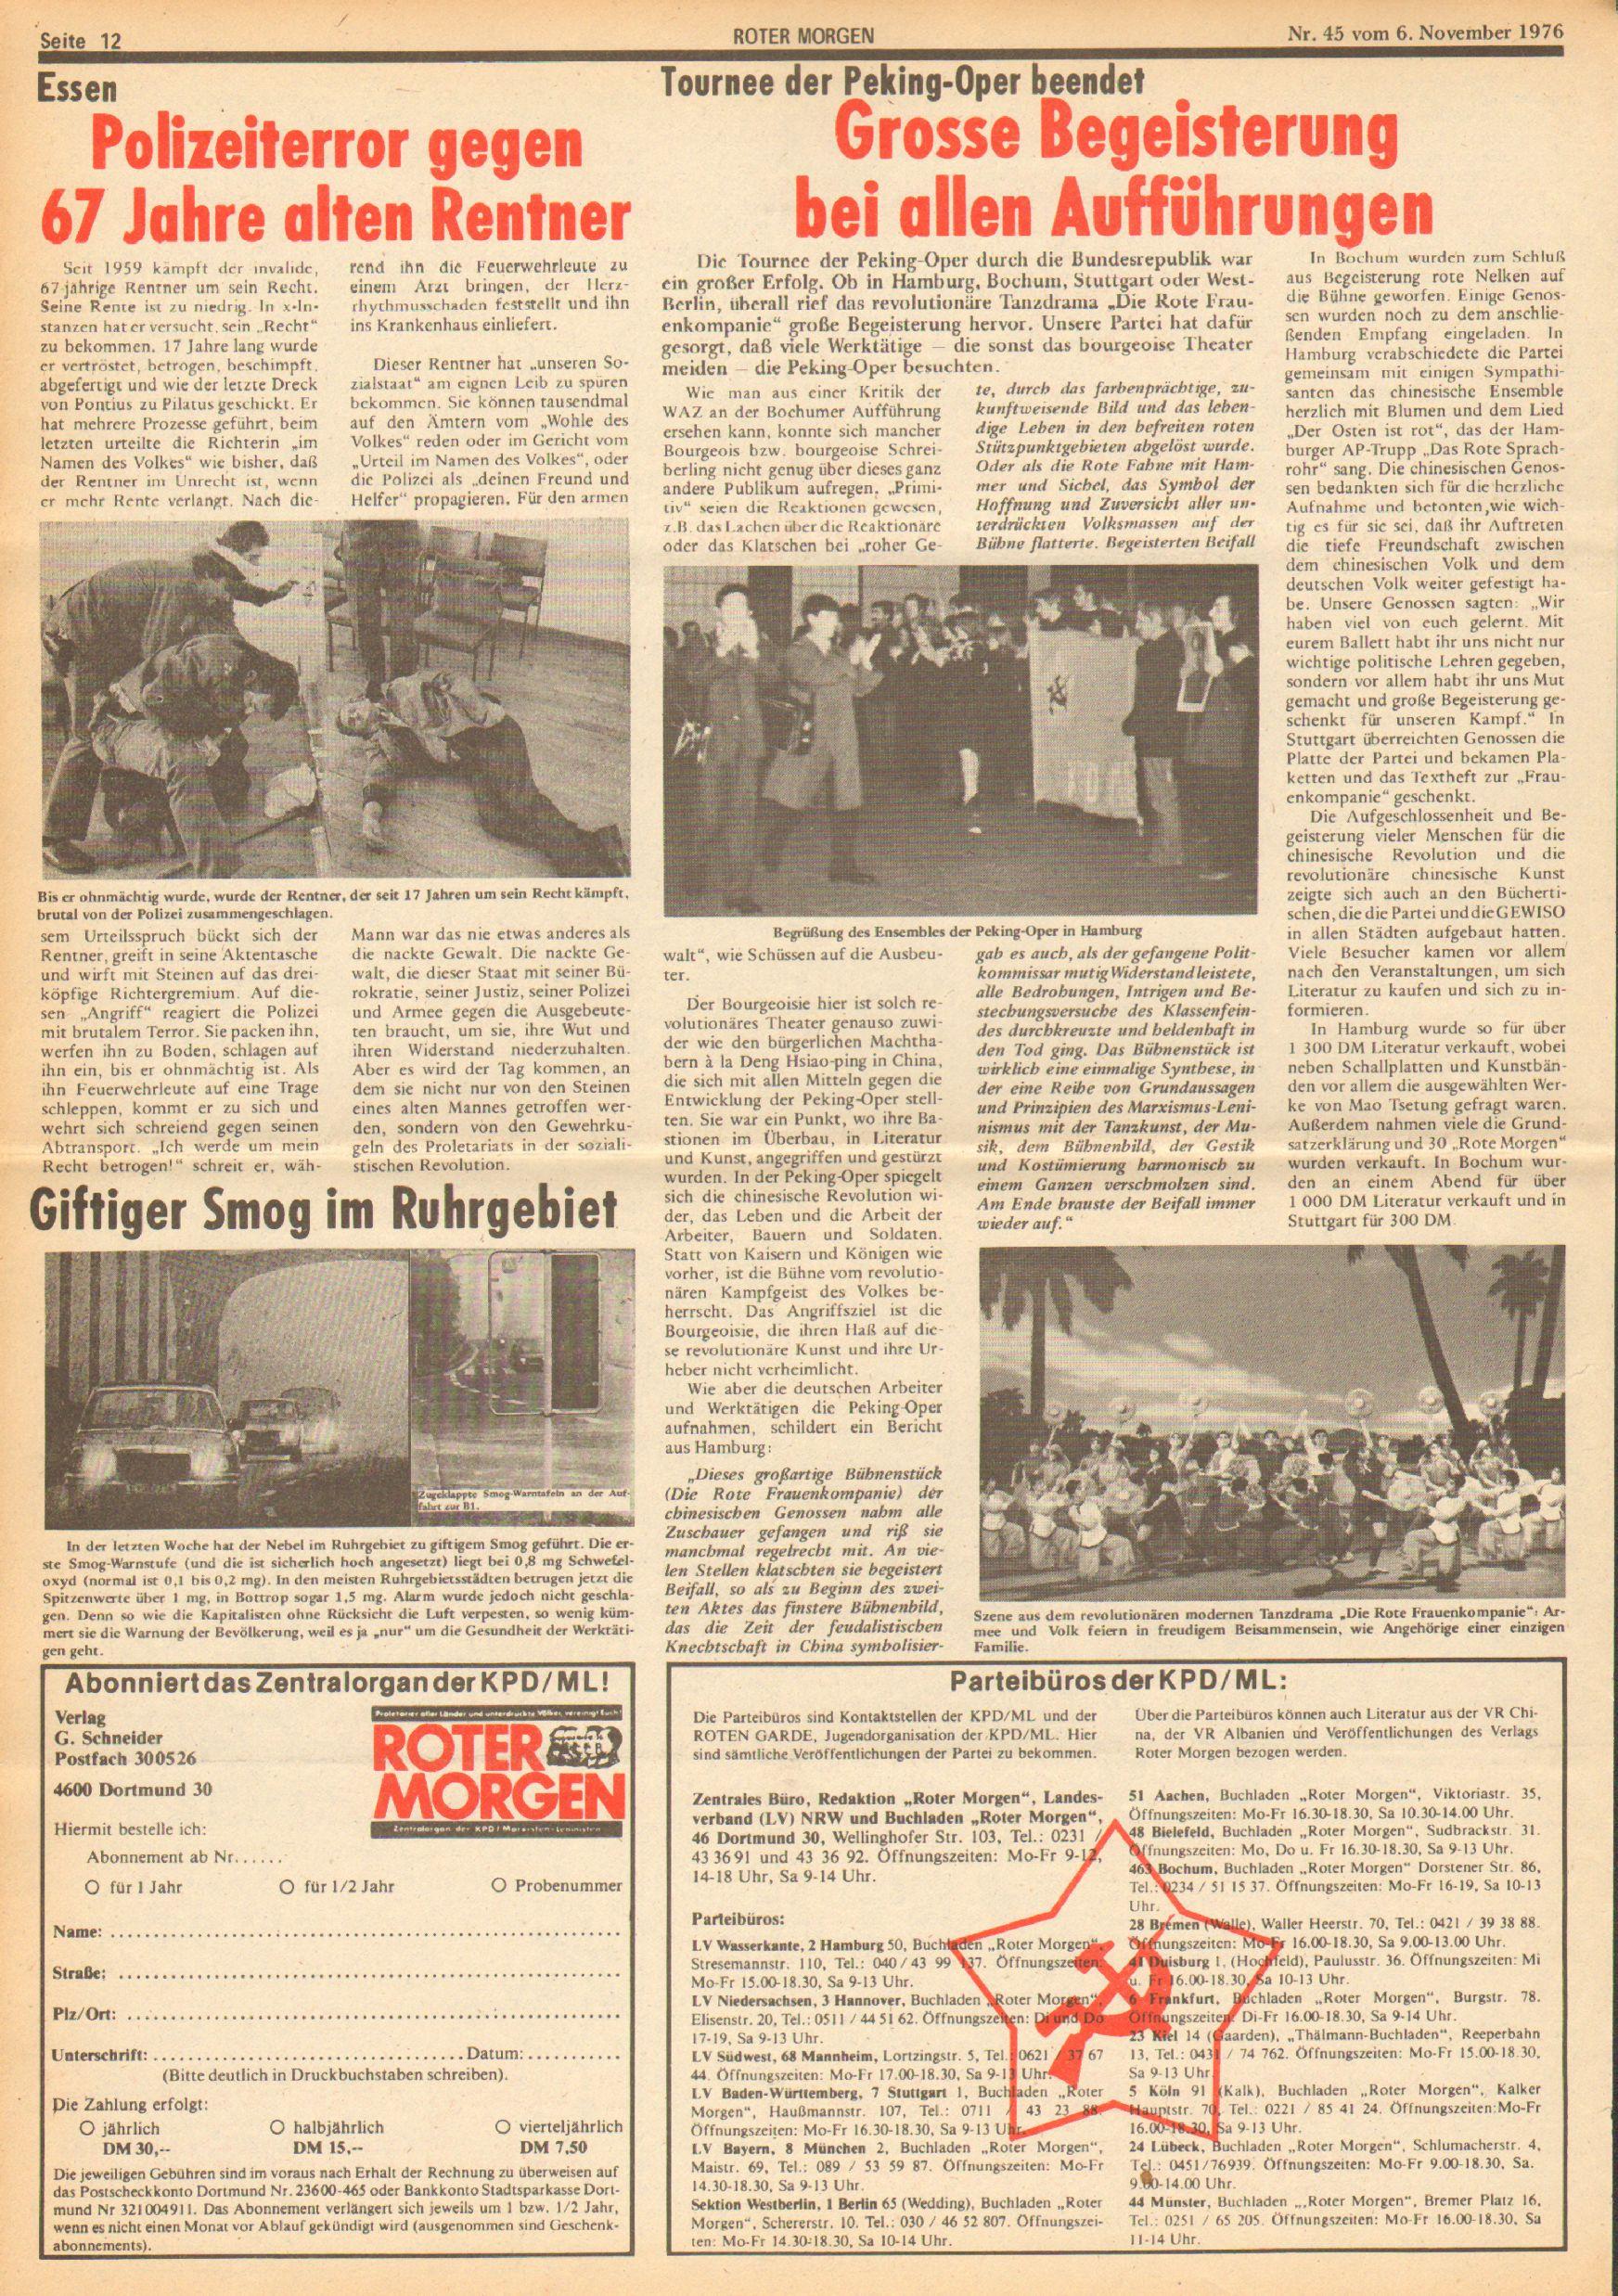 Roter Morgen, 10. Jg., 6. November 1976, Nr. 45, Seite 12